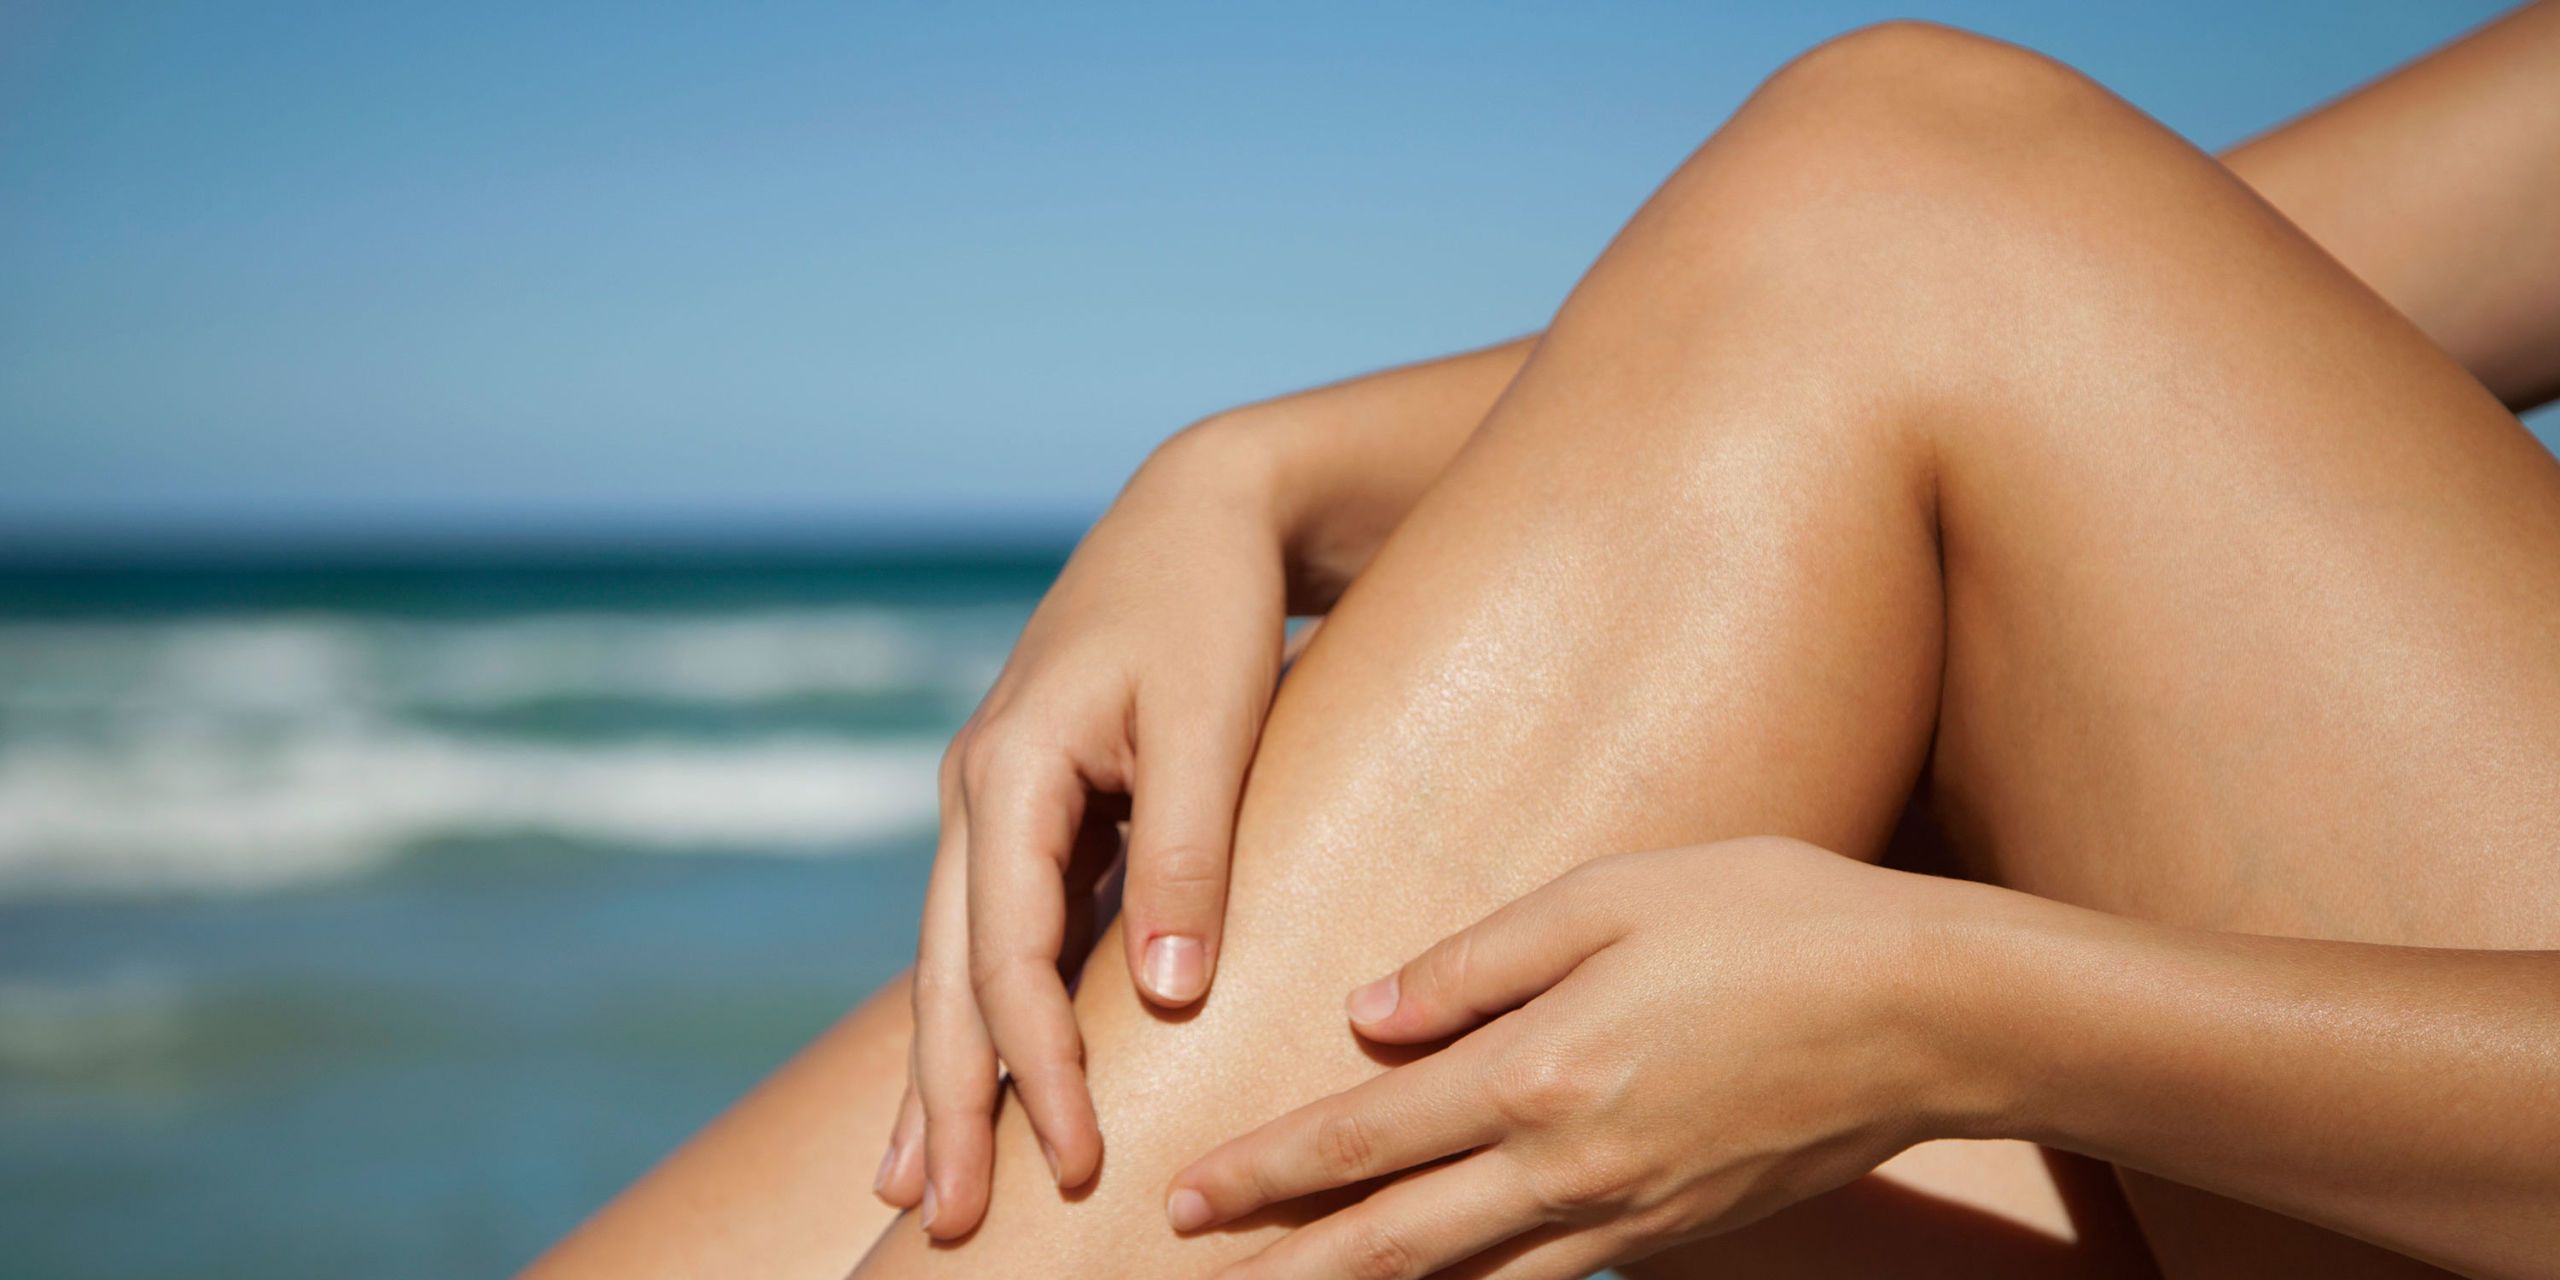 Adult london massage ontario